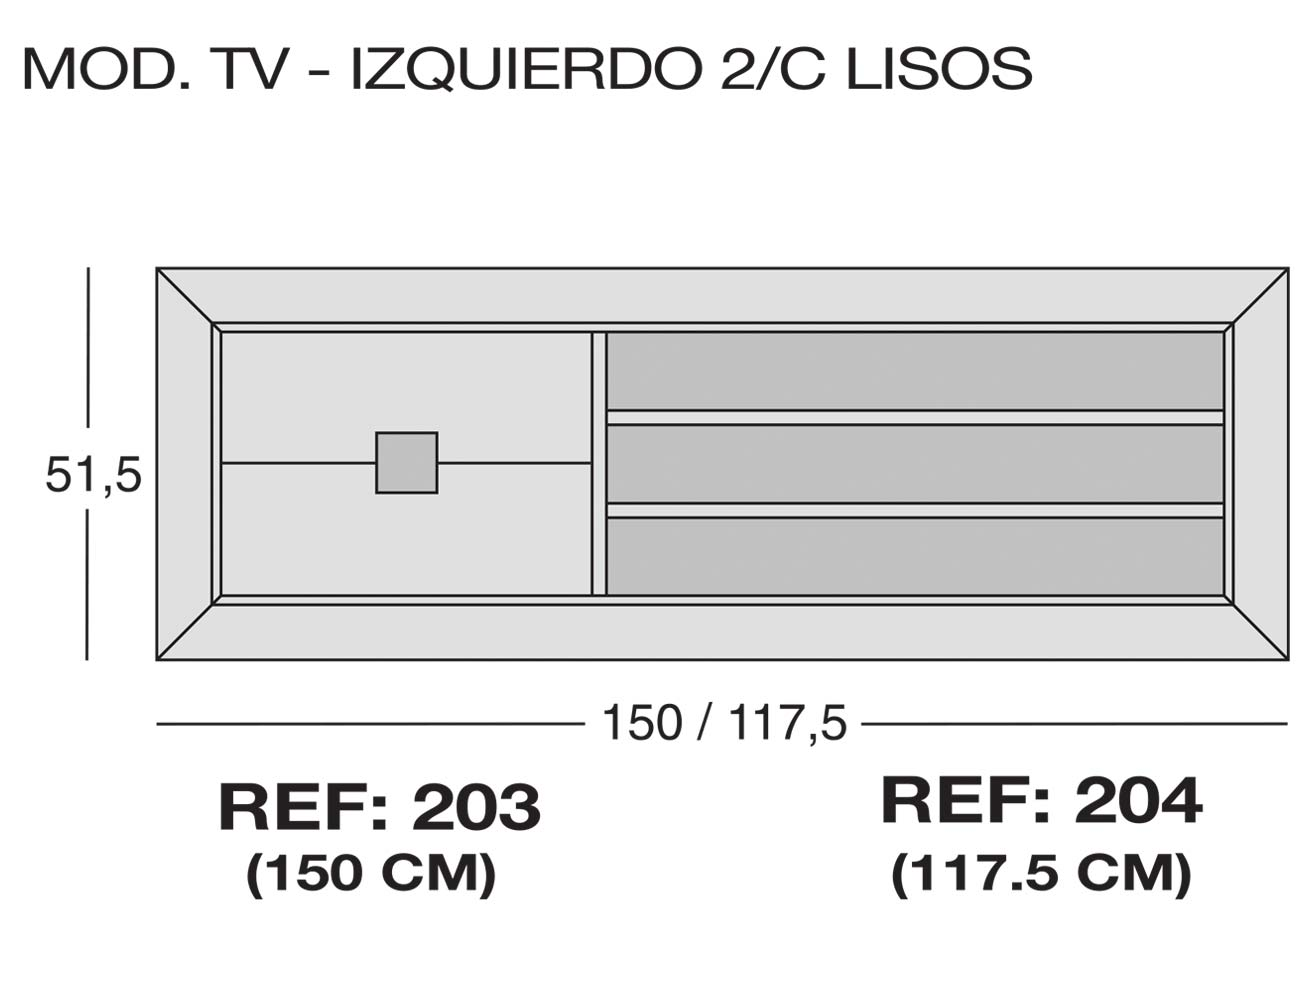 Modulo tv izquierdo 2c lisos 203 204